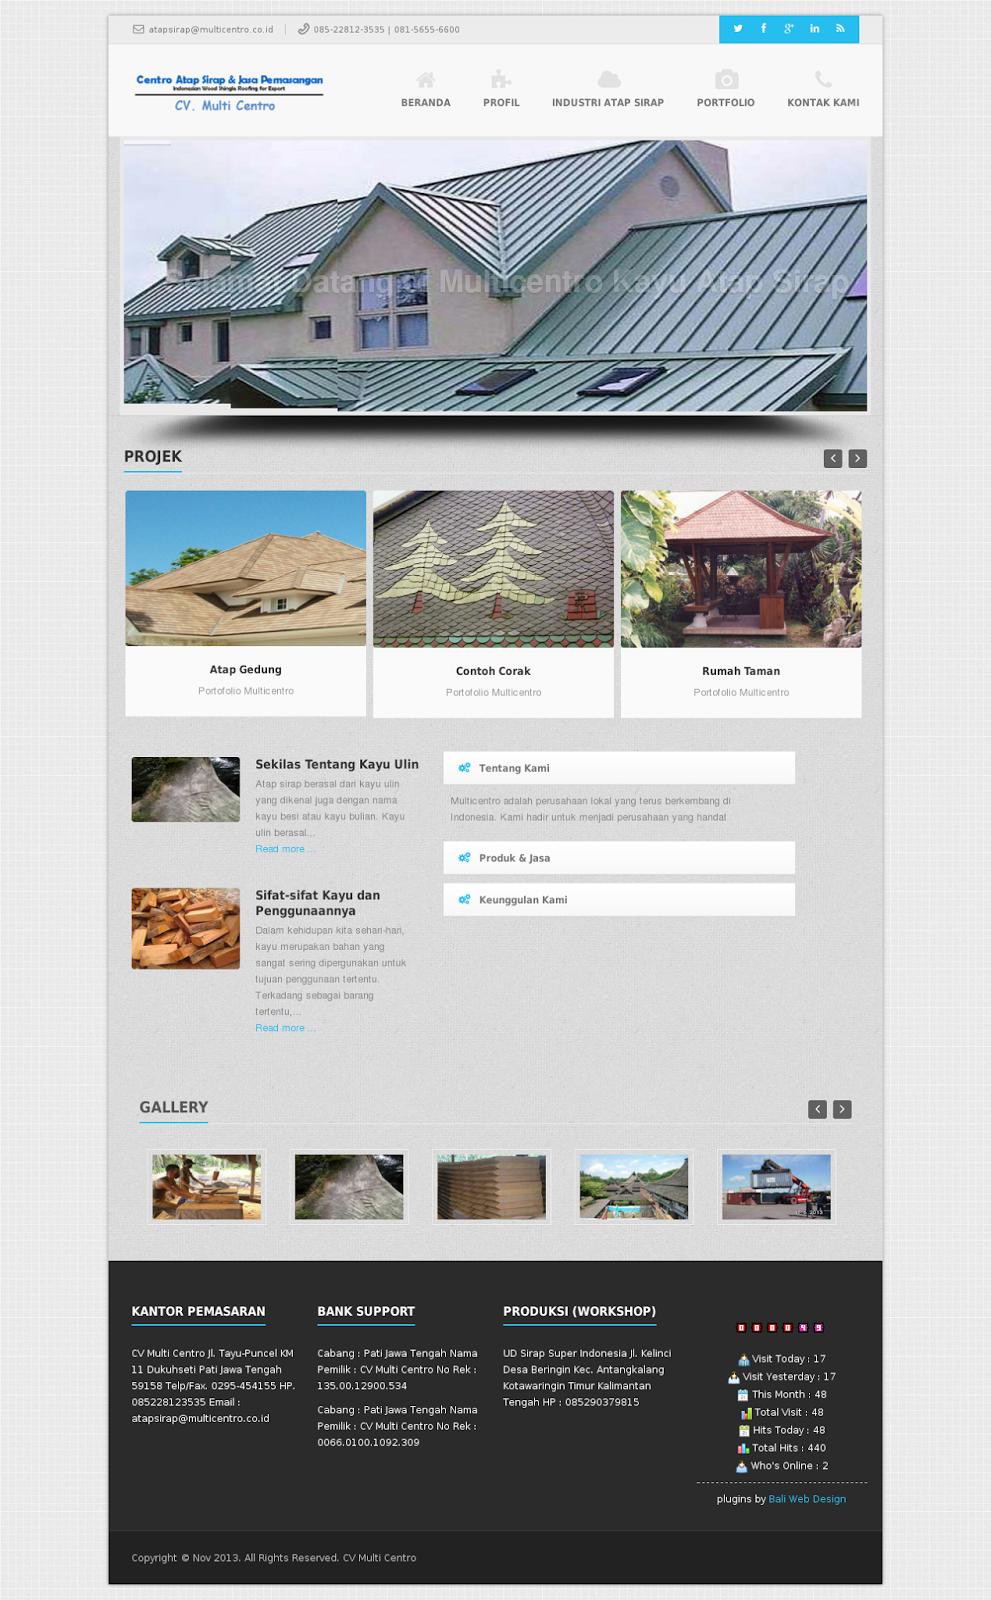 Contoh Website Profil Perusahaan